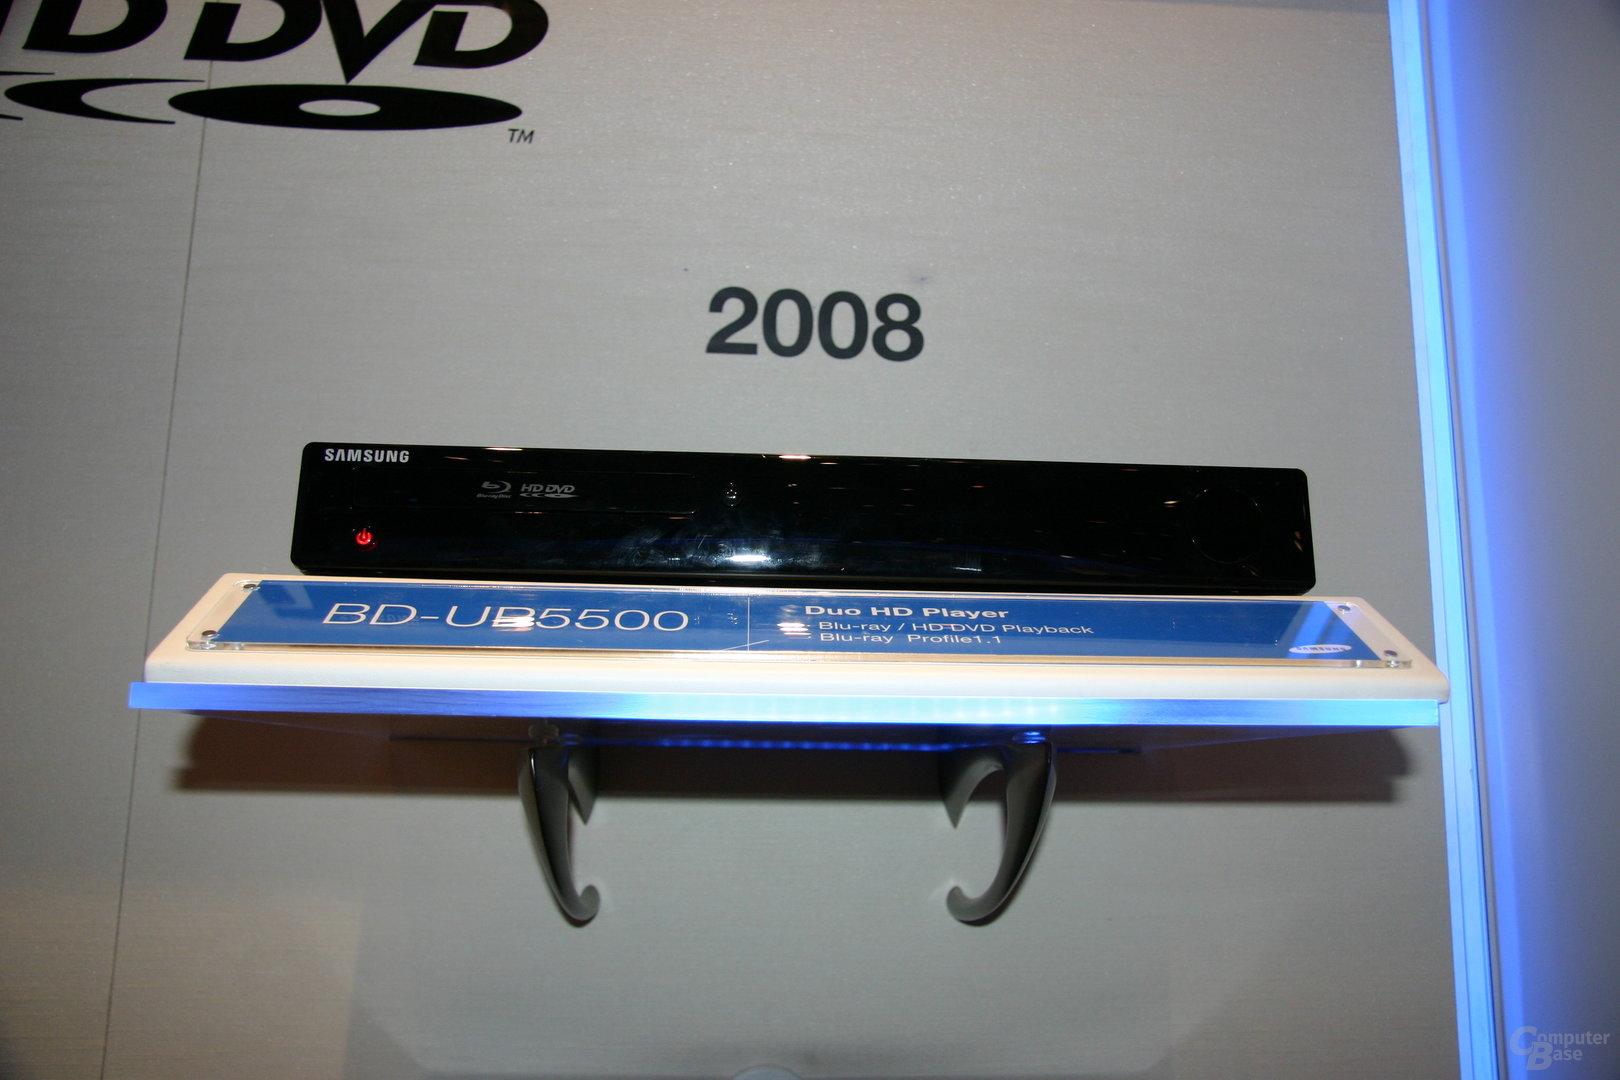 Samsung BD-UP5500